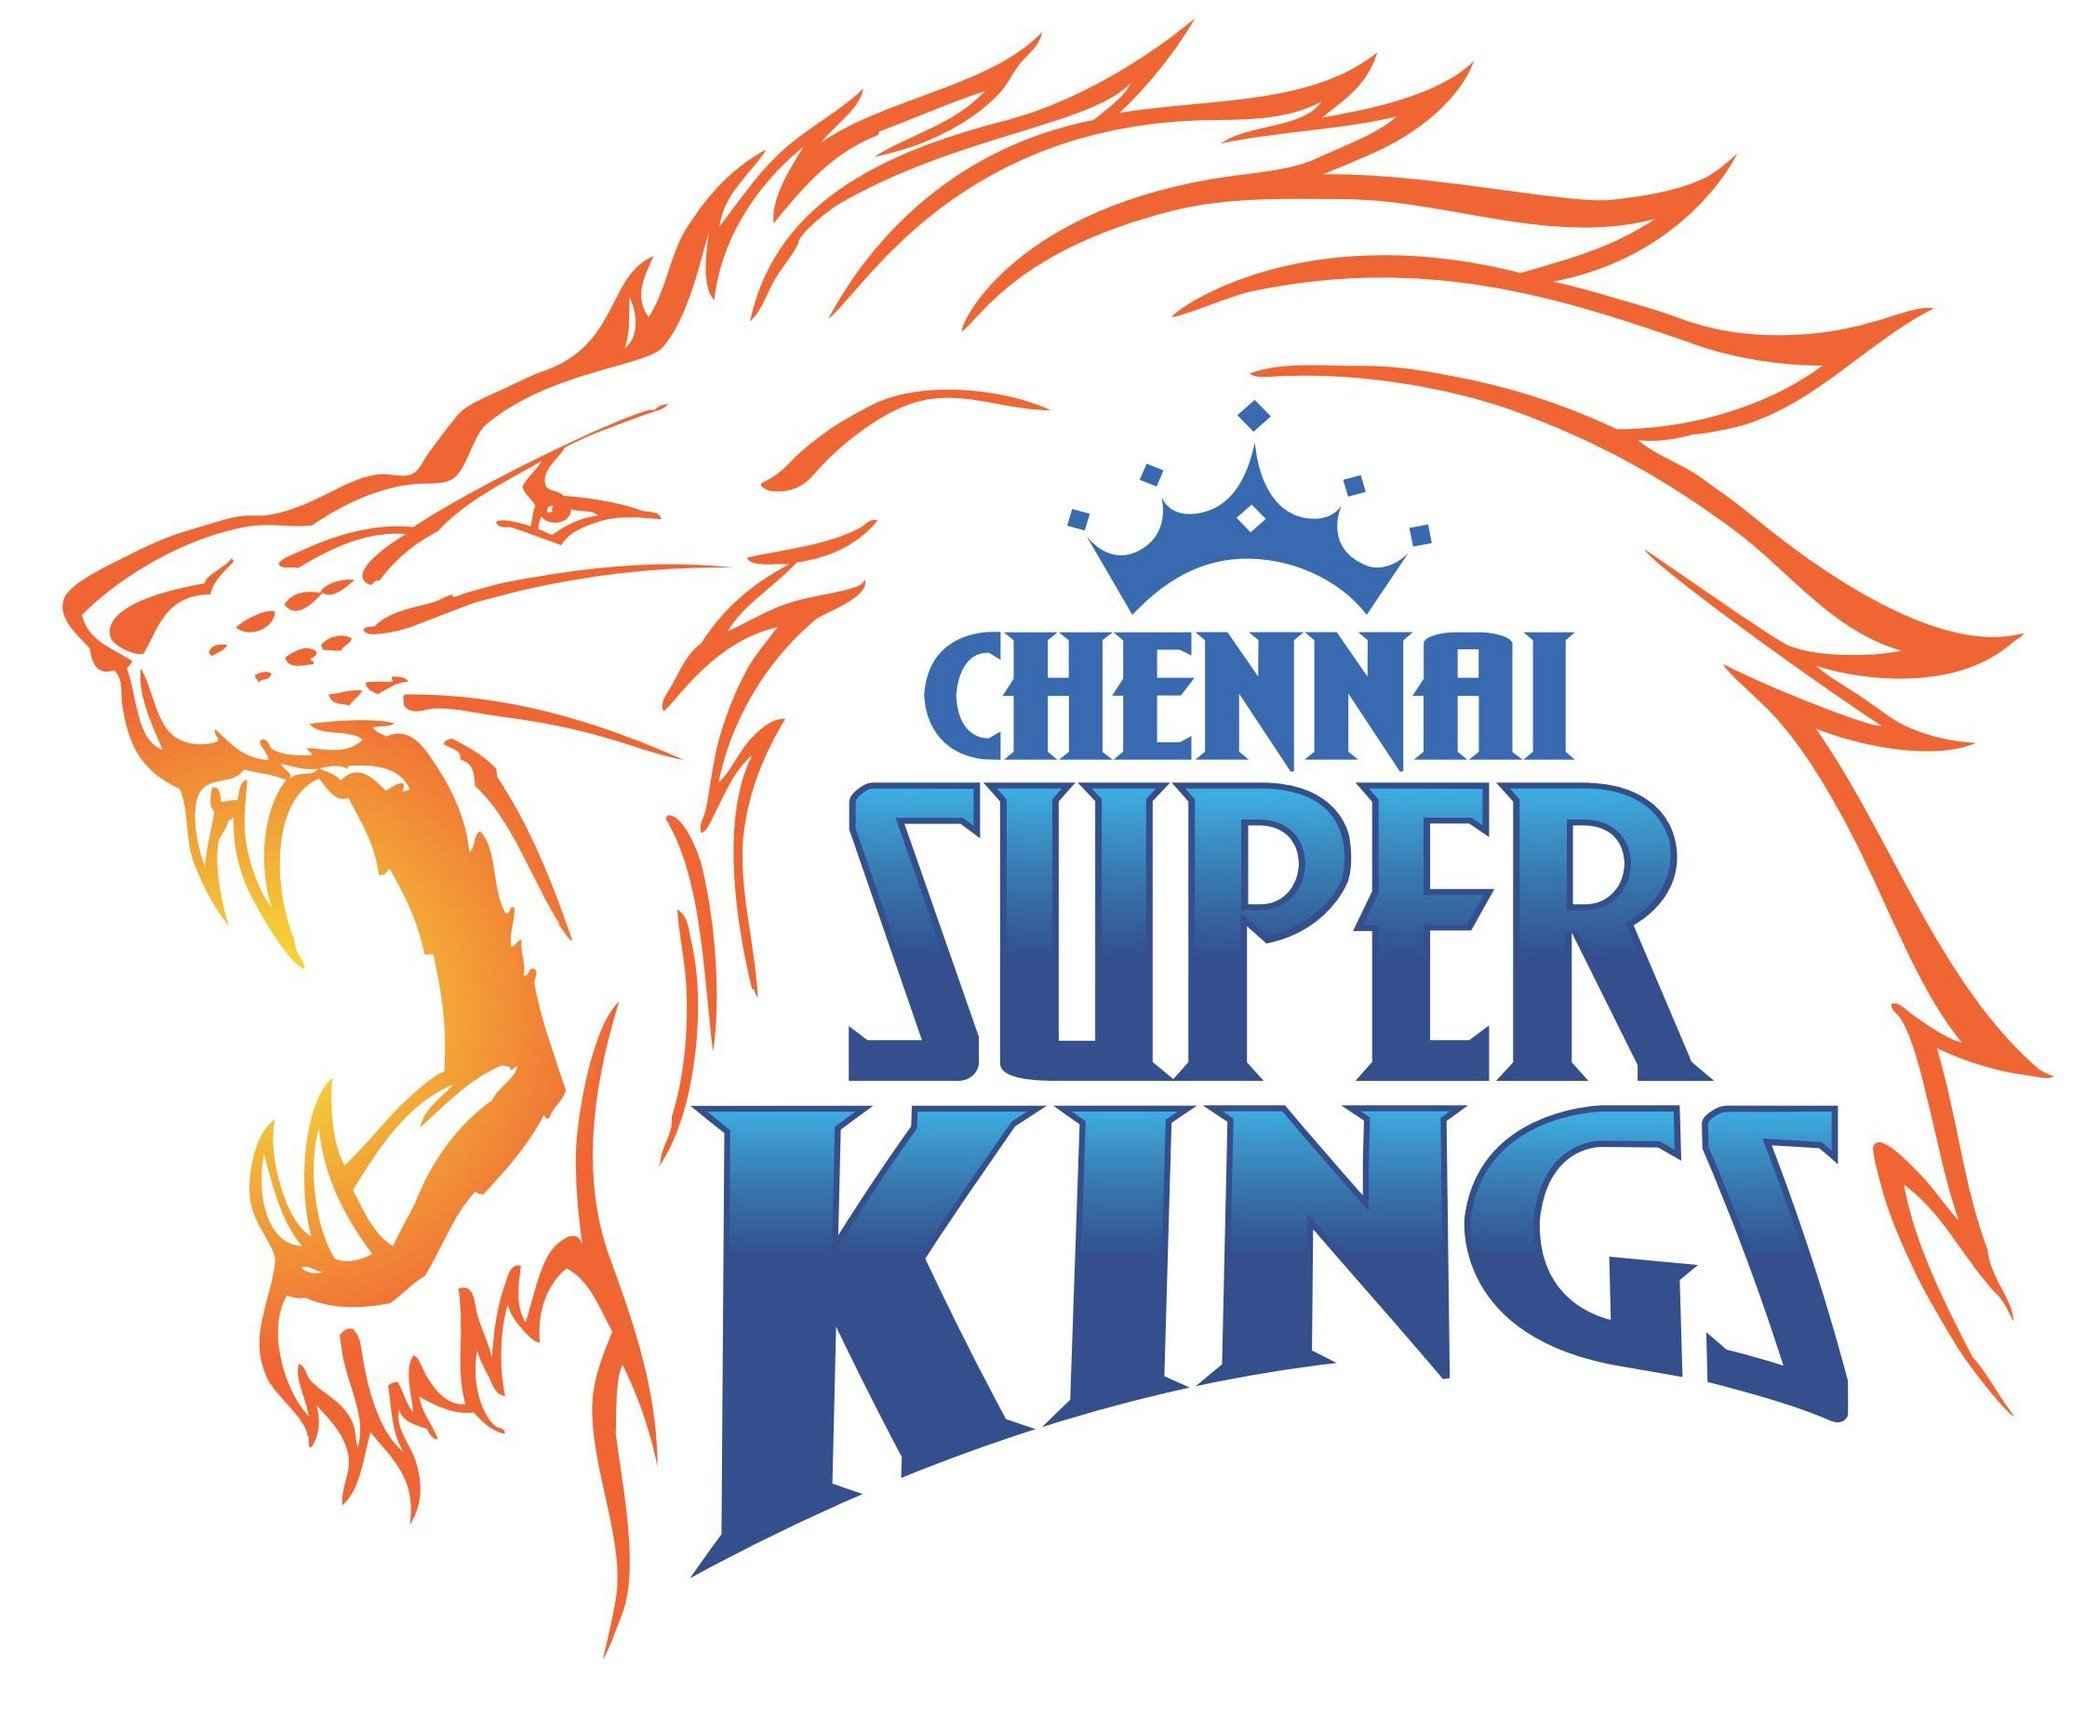 Chennai Super Kings Logo Vector [EPS File] Vector EPS Free Download, Logo, Icons, Brand Emblems